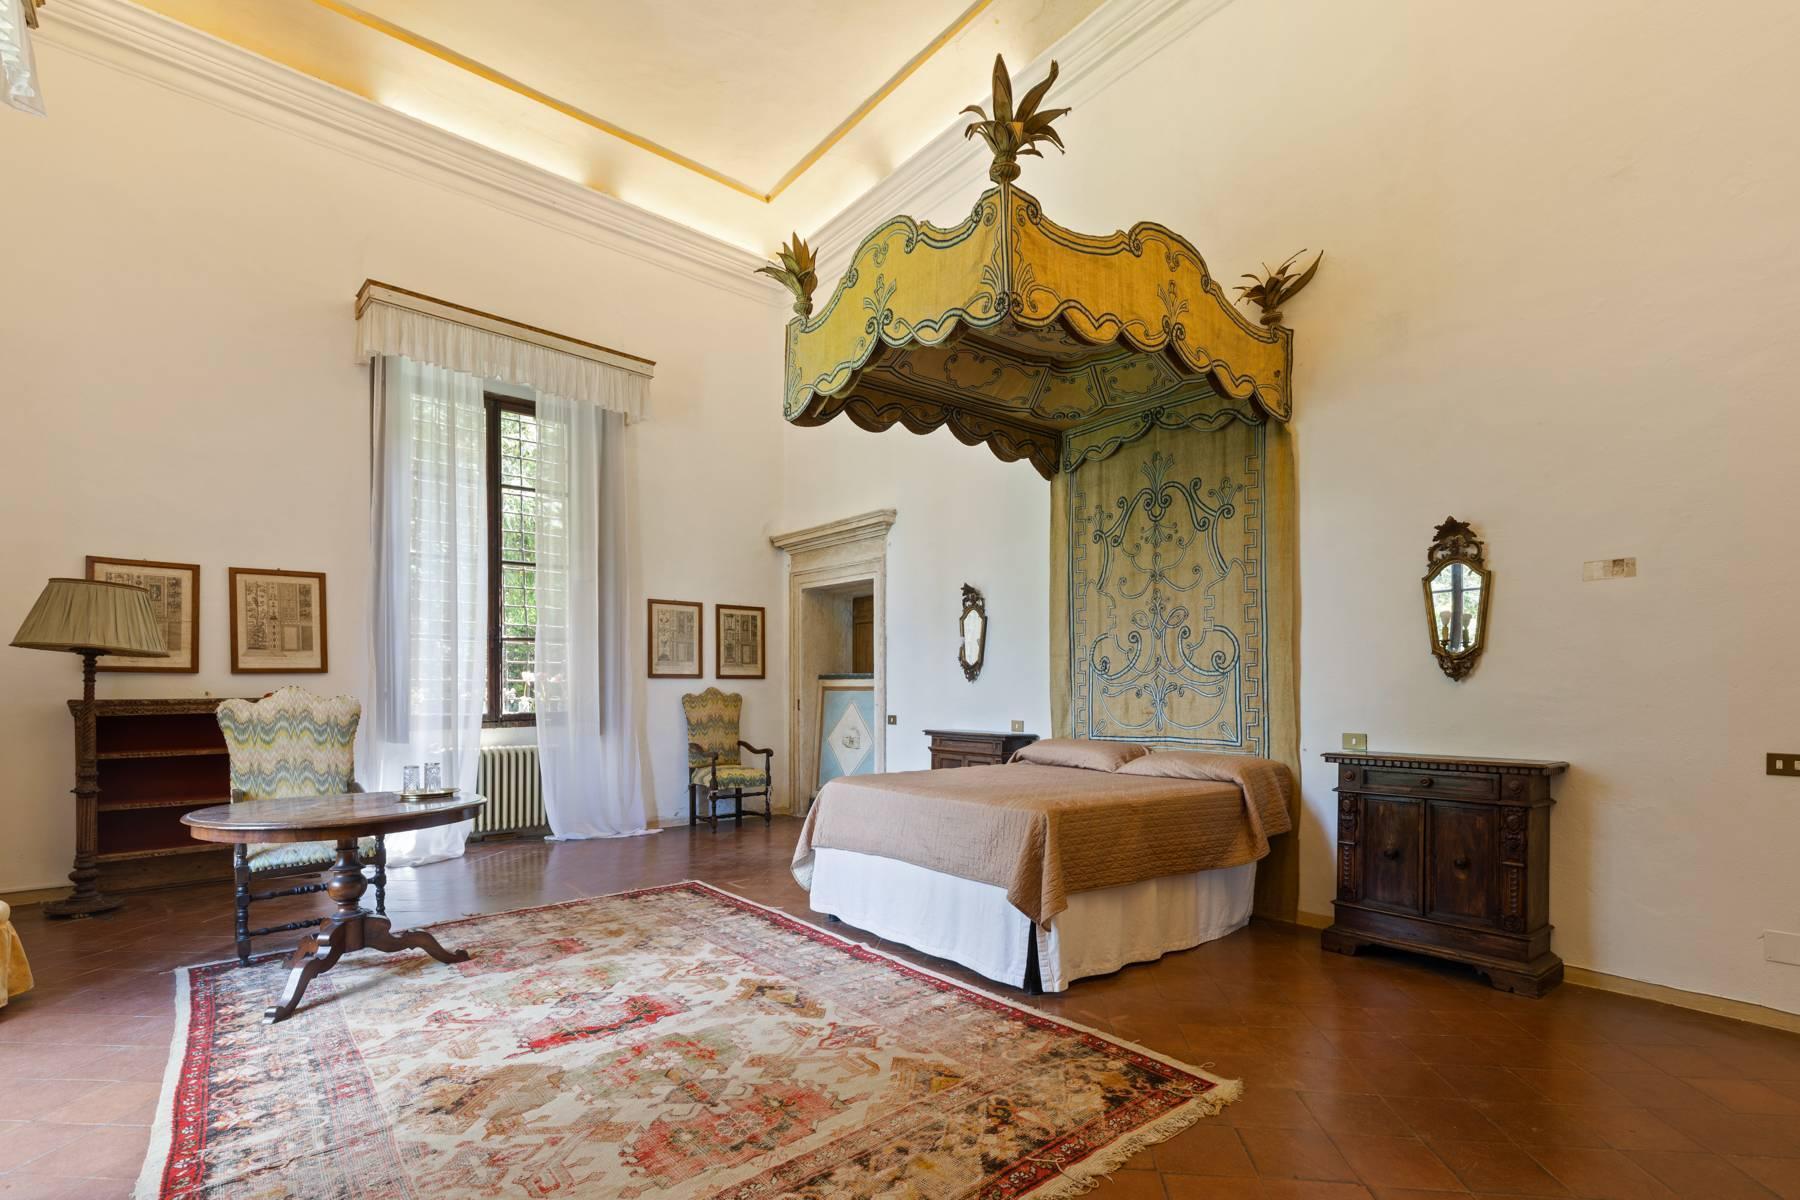 Affascinante villa Veneta a pochi minuti da Verona - 25